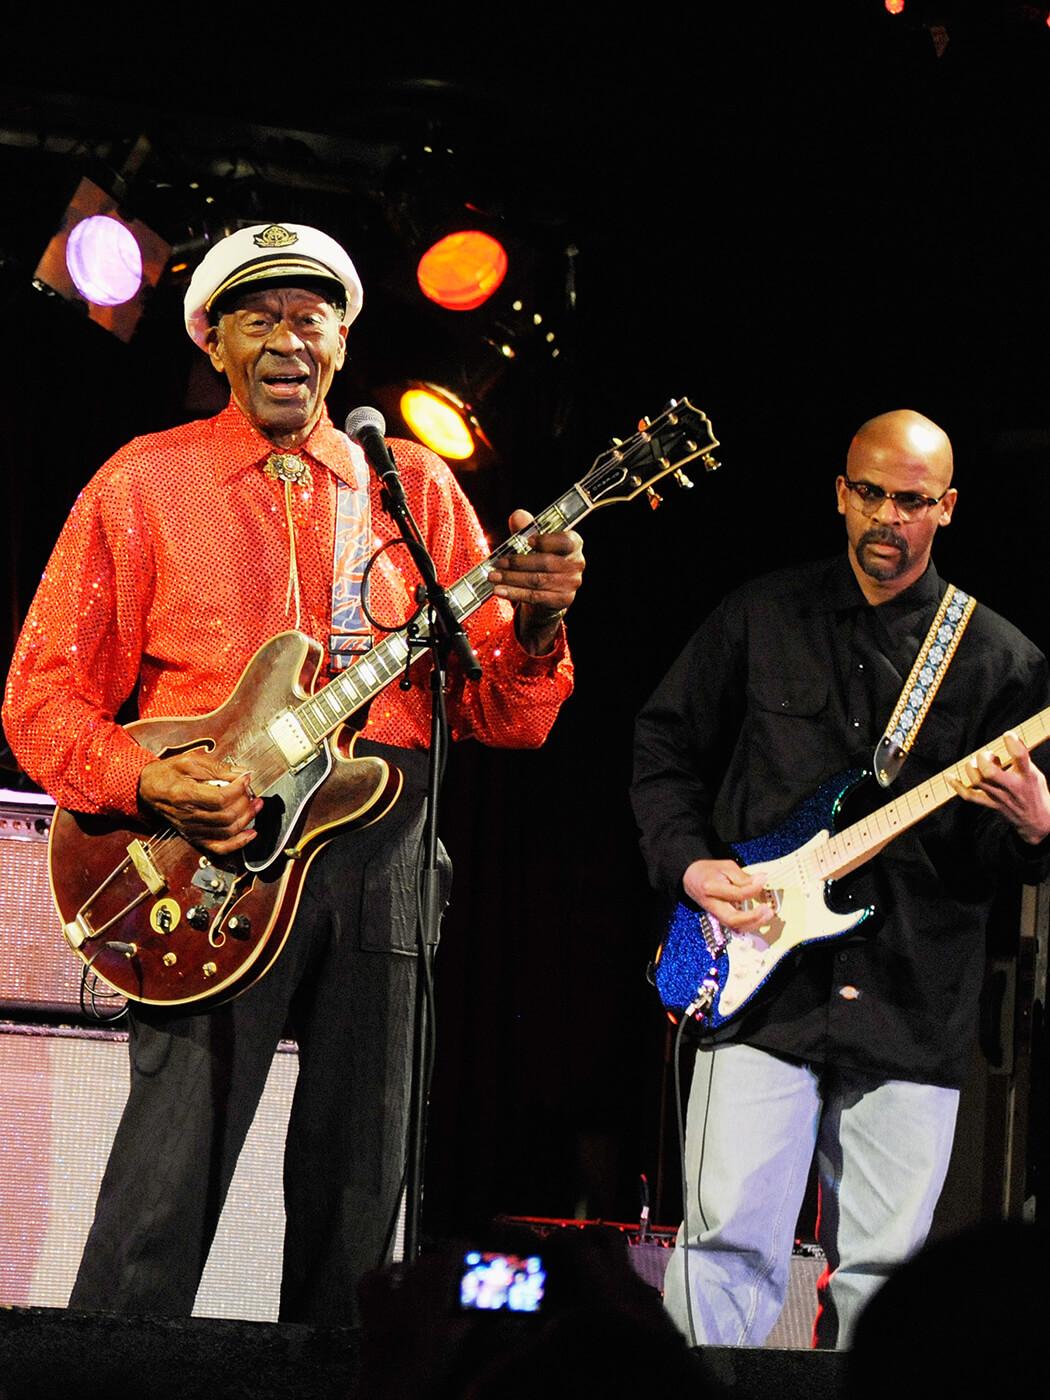 Chuck Berry Sr and Chuck Berry Jr